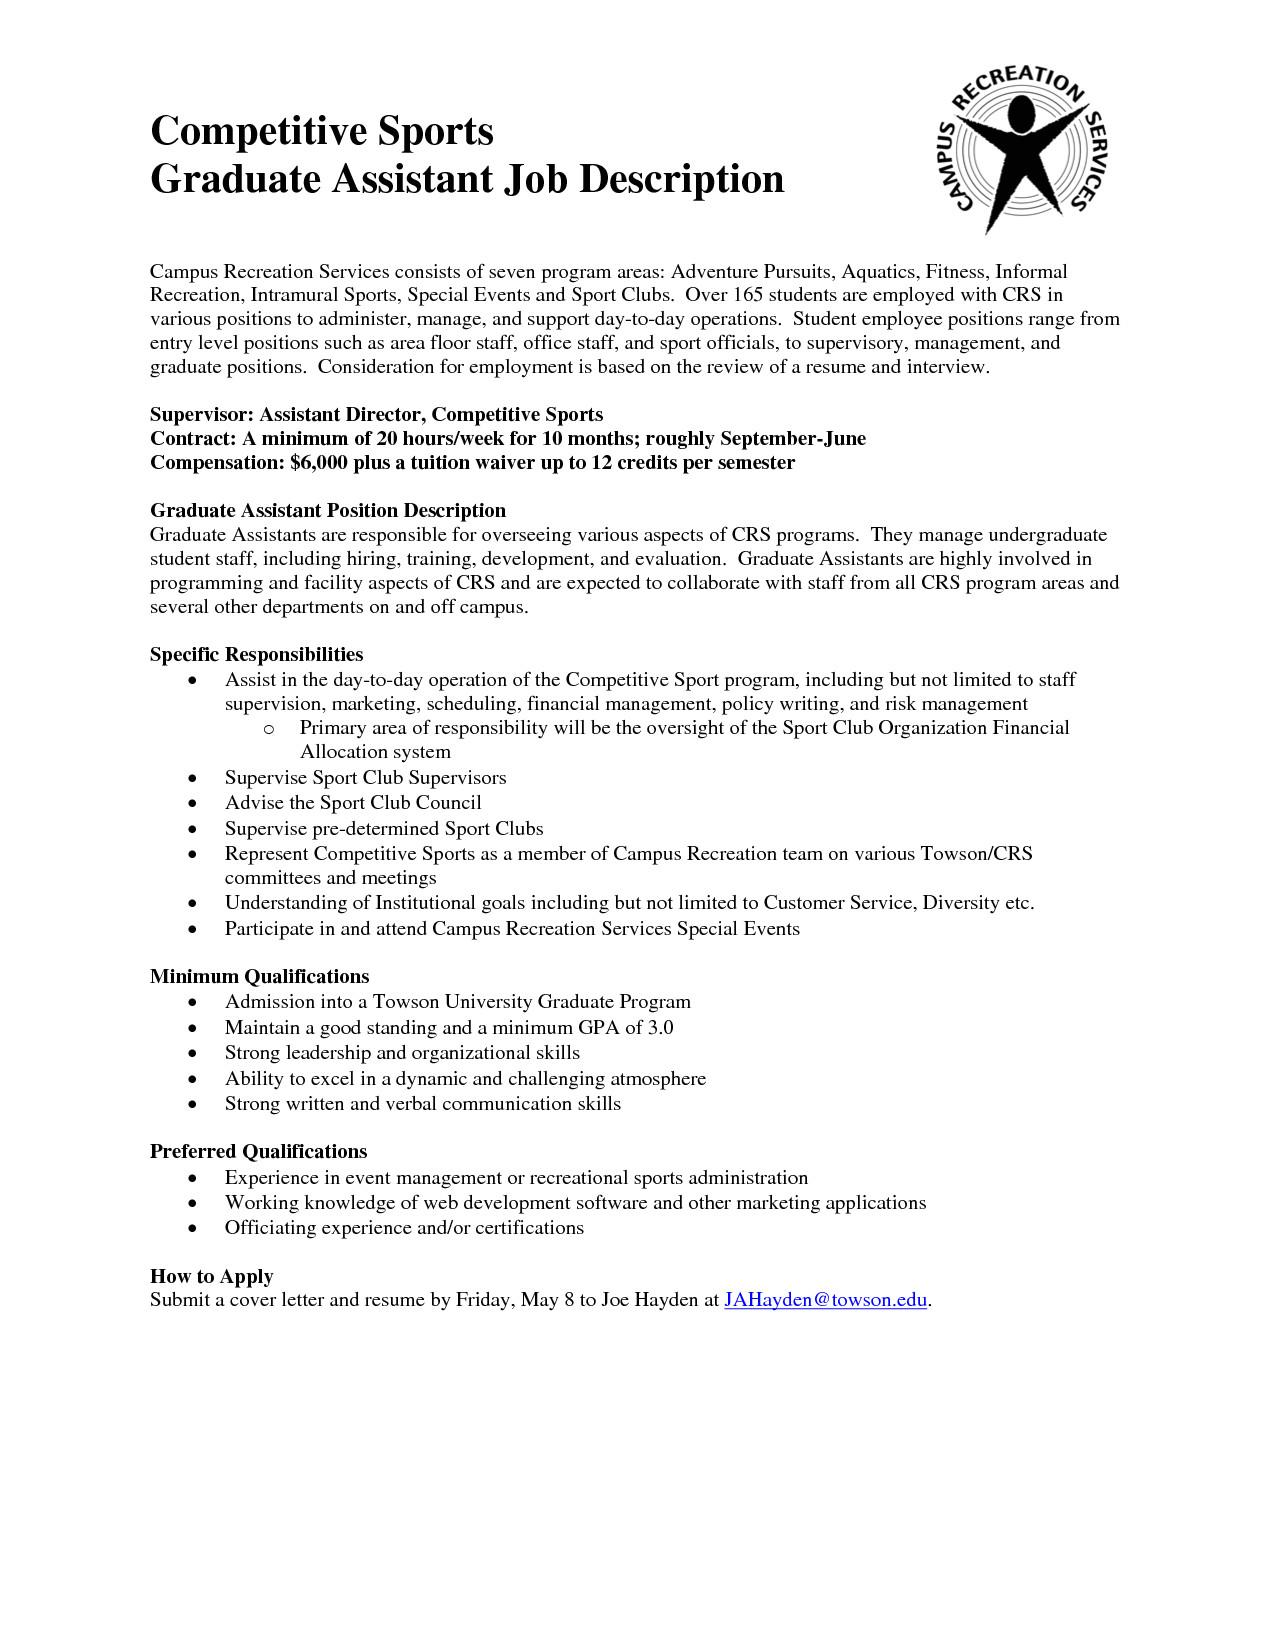 resume sample graduate assistant